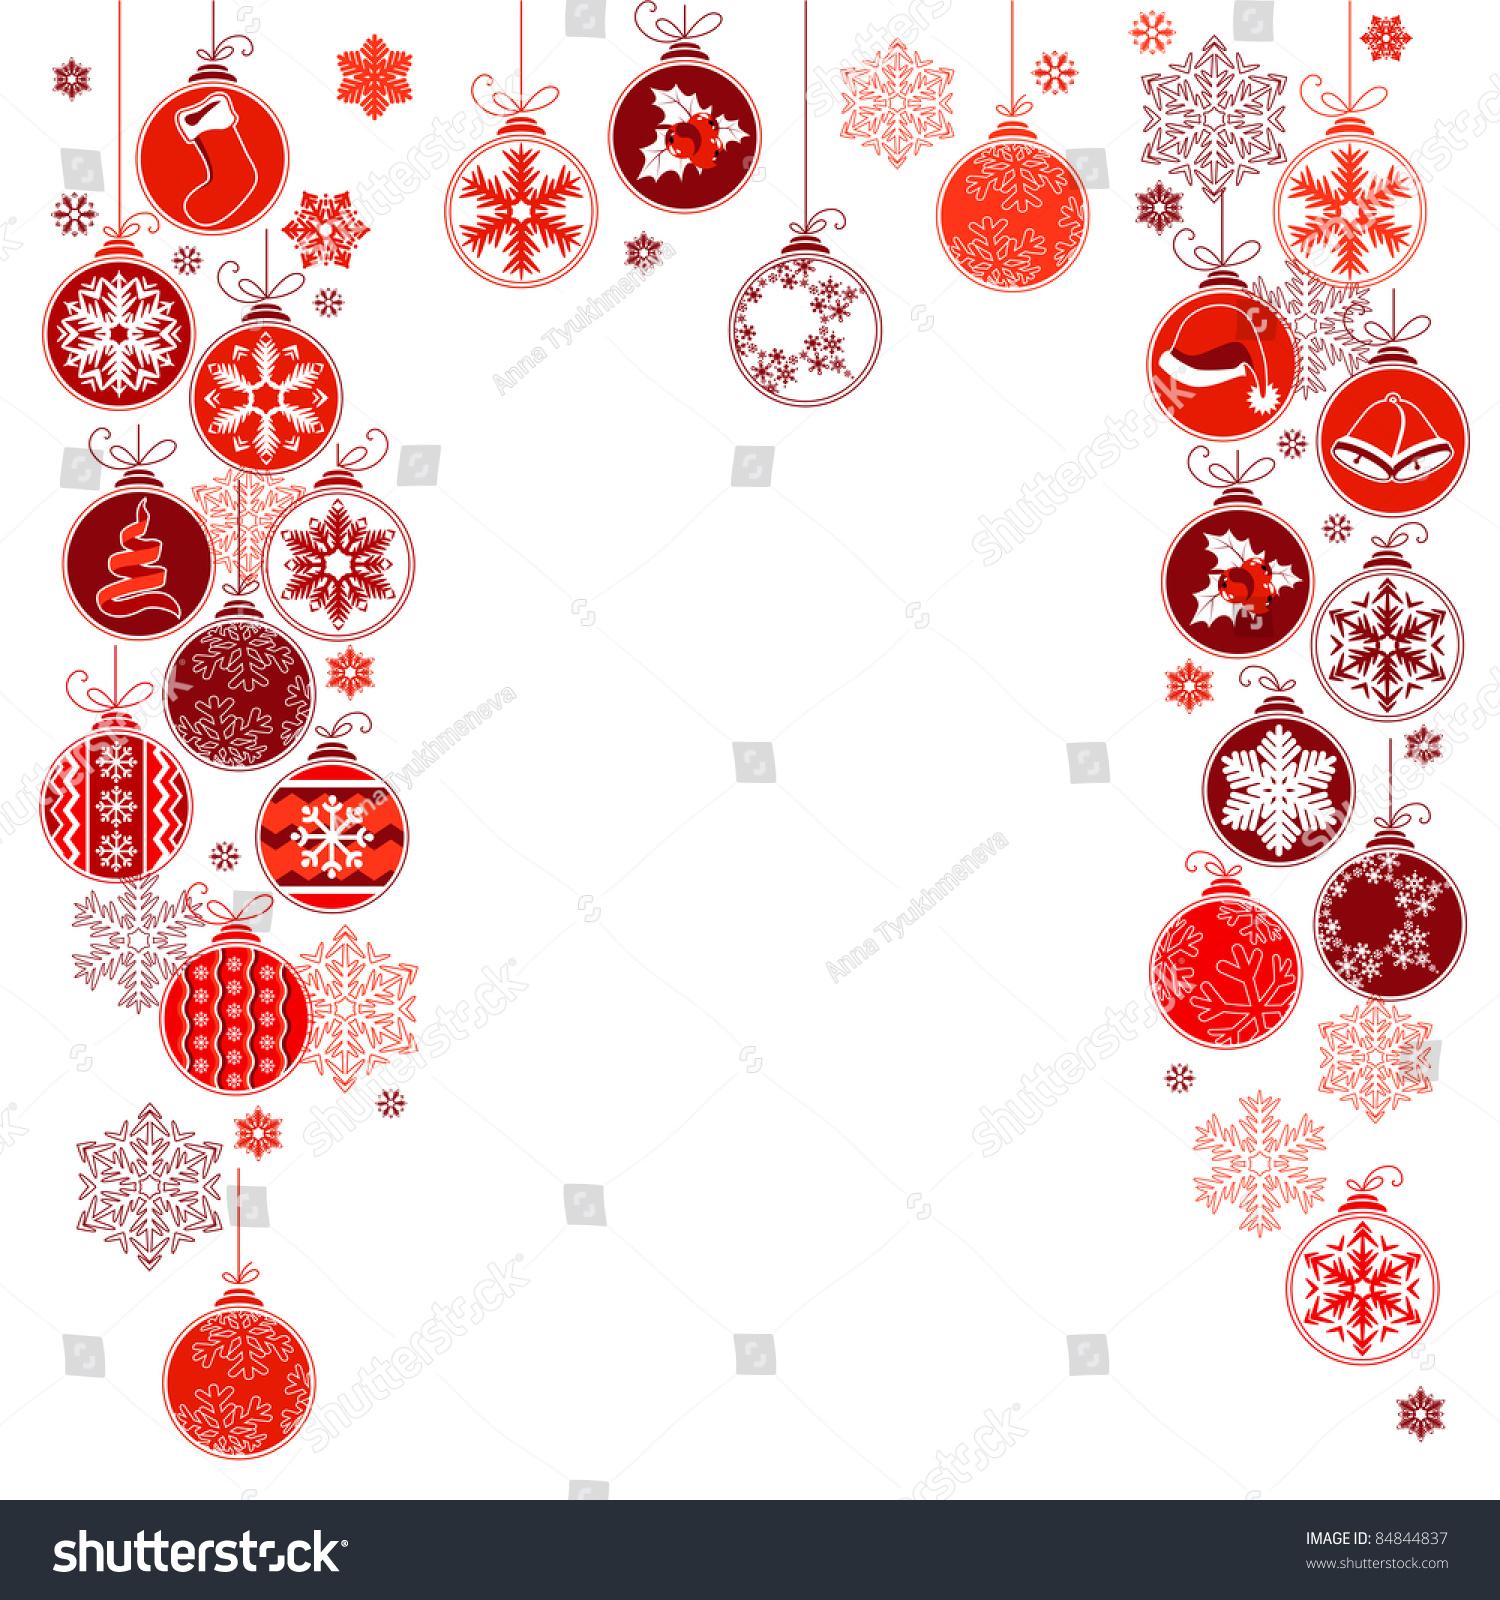 blank christmas frame contour hanging balls stock vector  blank christmas frame contour hanging balls